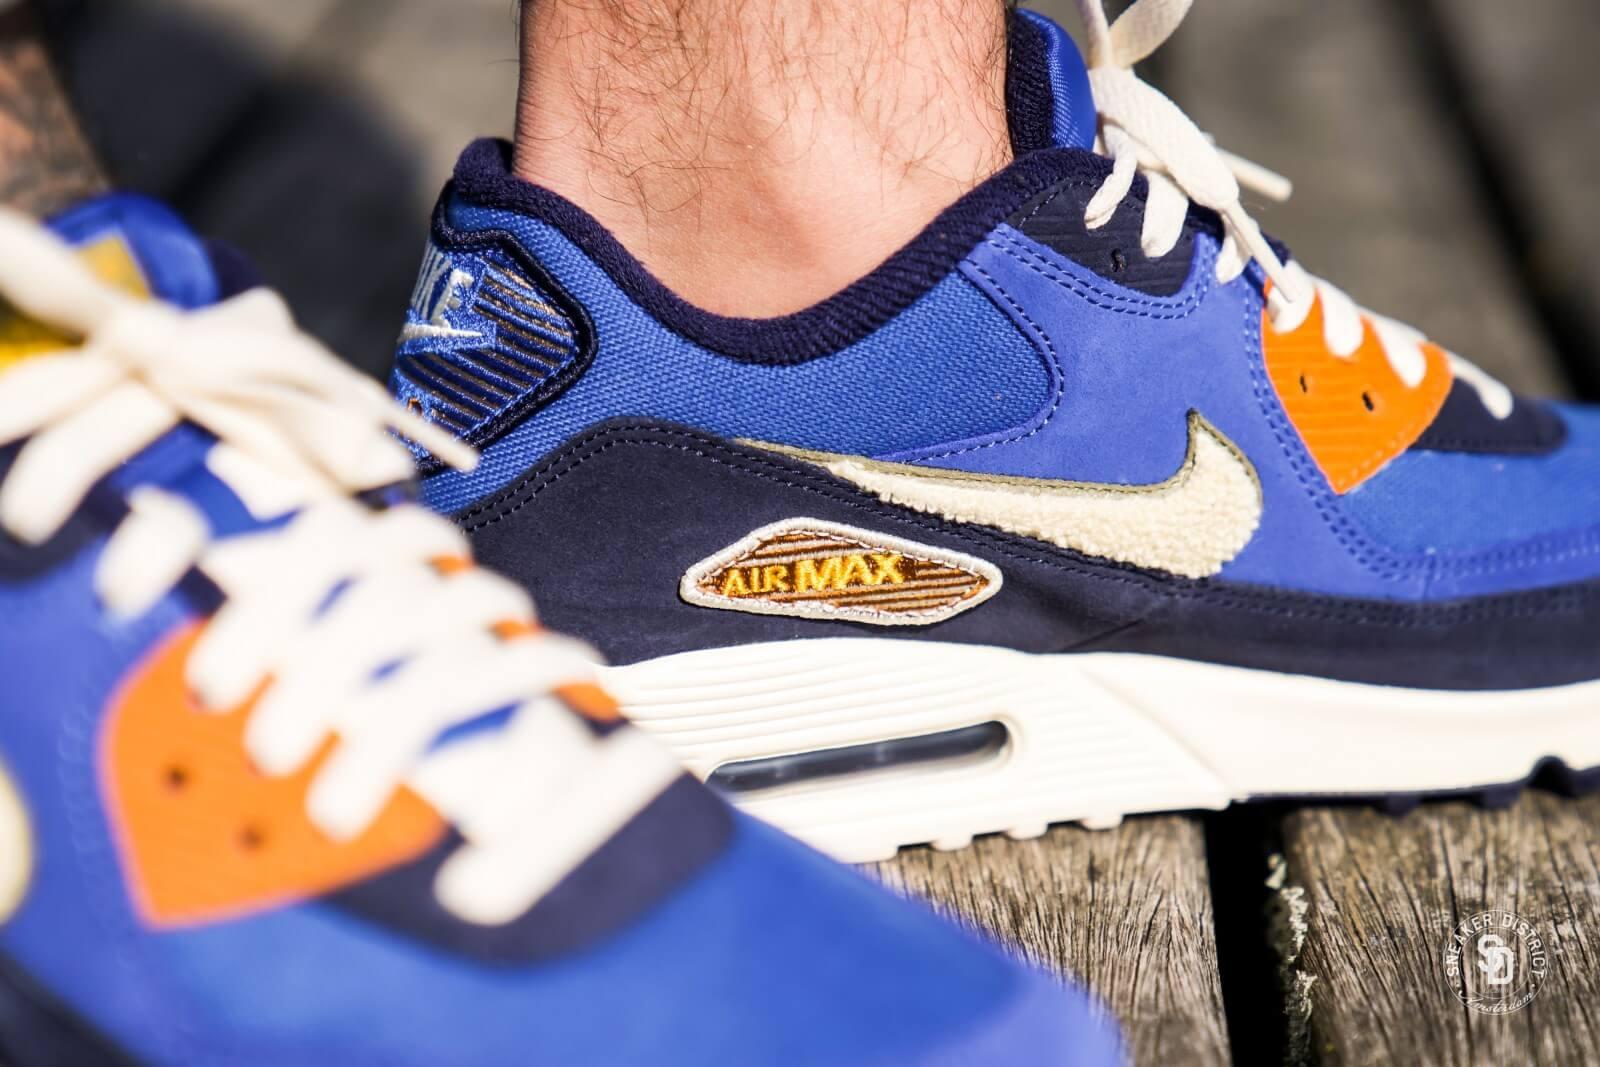 Lifestyle Shoes Nike Air Max 90 Premium Phanto Gunsmoke